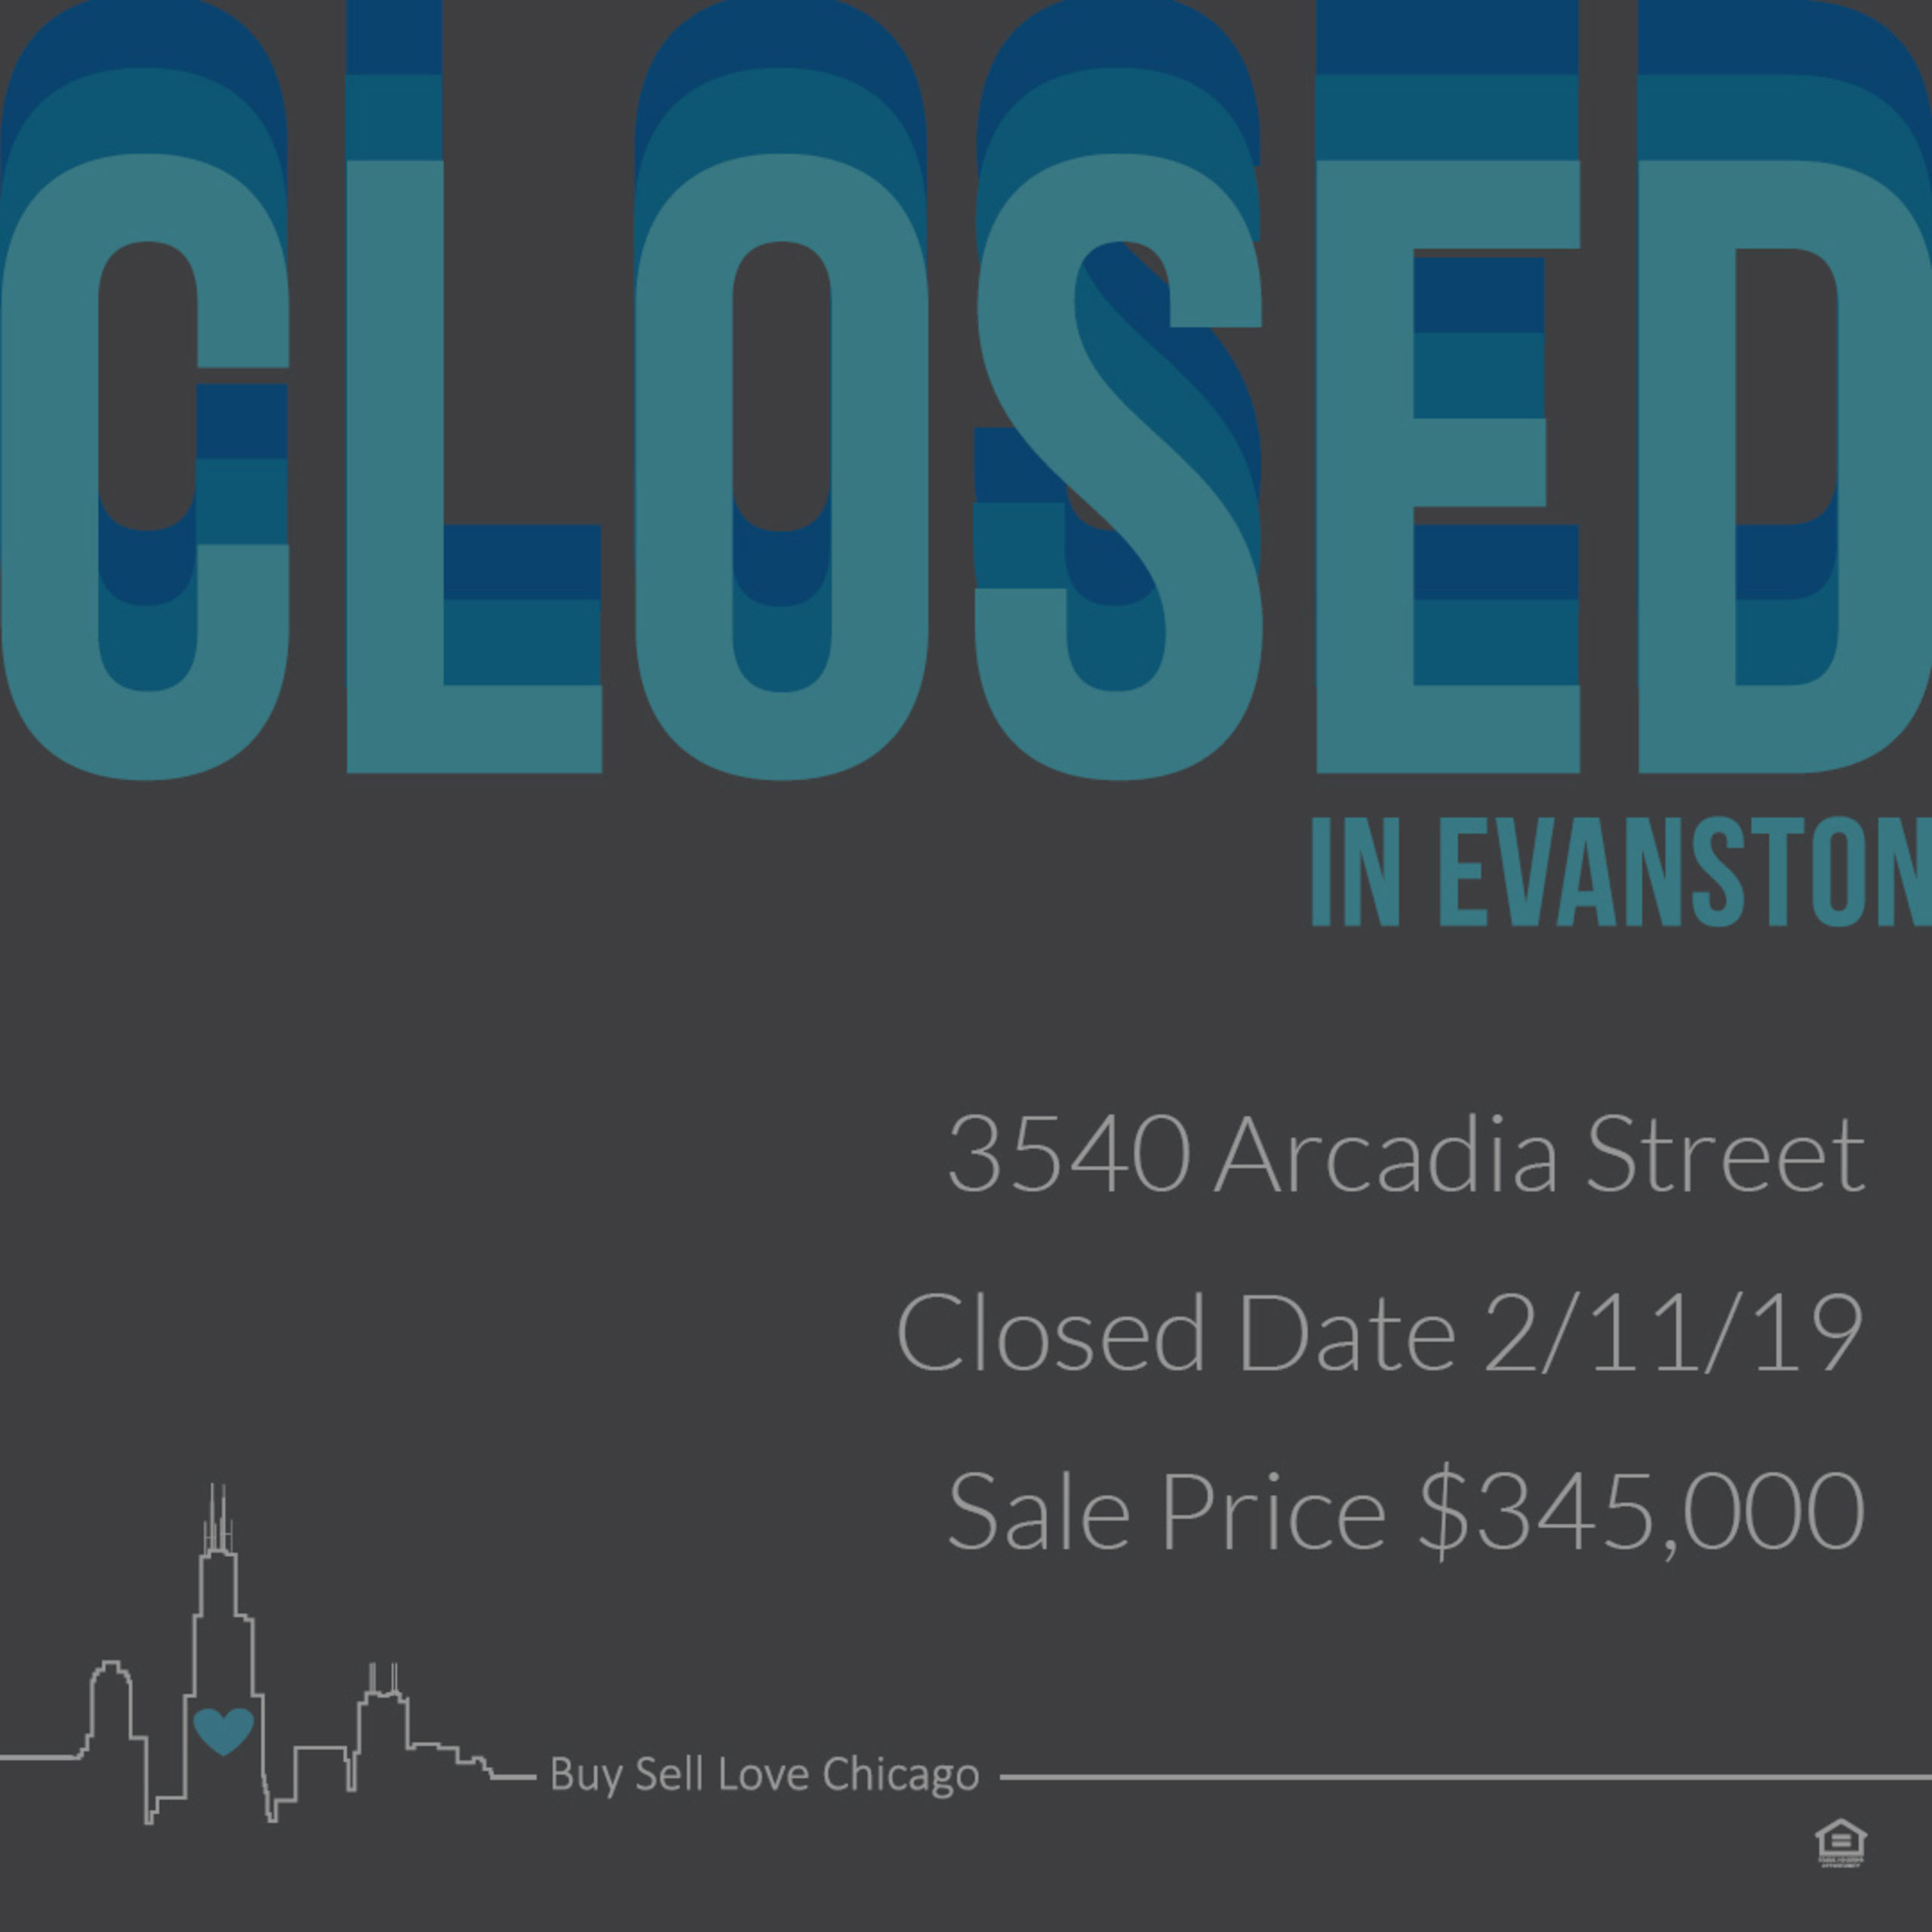 JUST SOLD: 3540 ARCADIA ST, EVANSTON, IL 60203